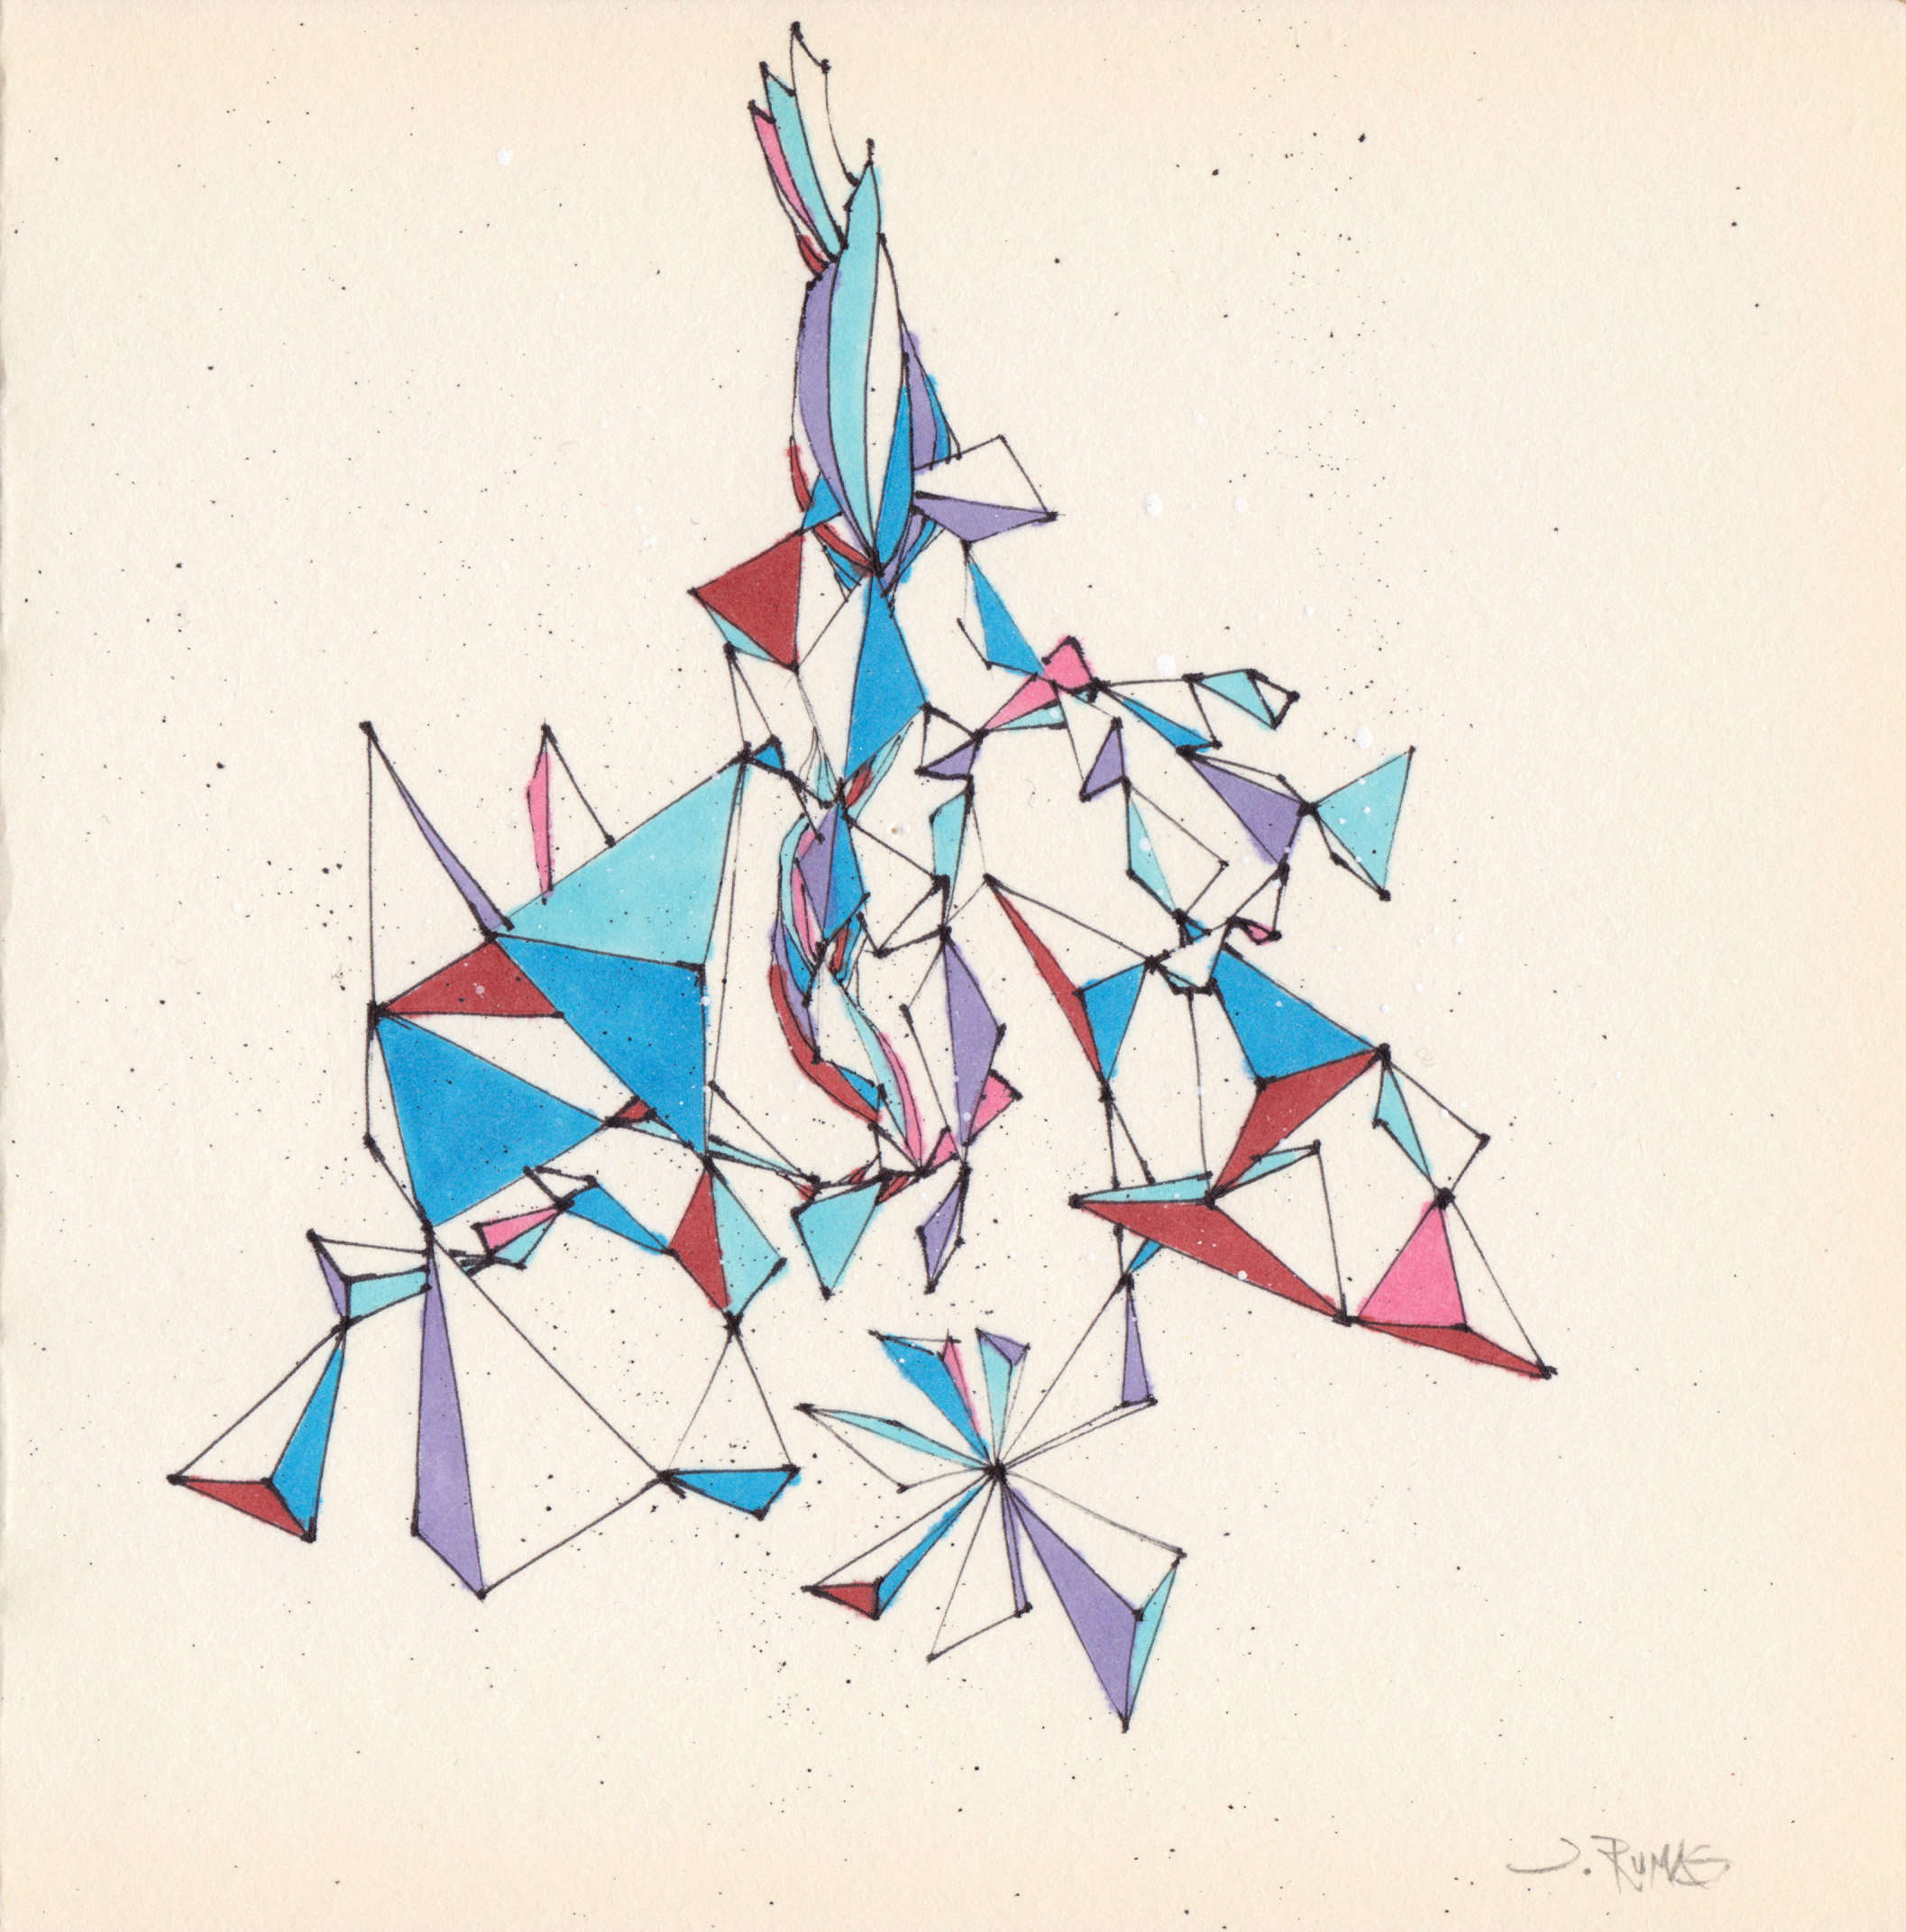 JEREMY RUMAS ART + PEN and MARKER SKETCHES 07a + abstract futurism + modern art + contemporary art +www.jeremyrumas.com.jpg